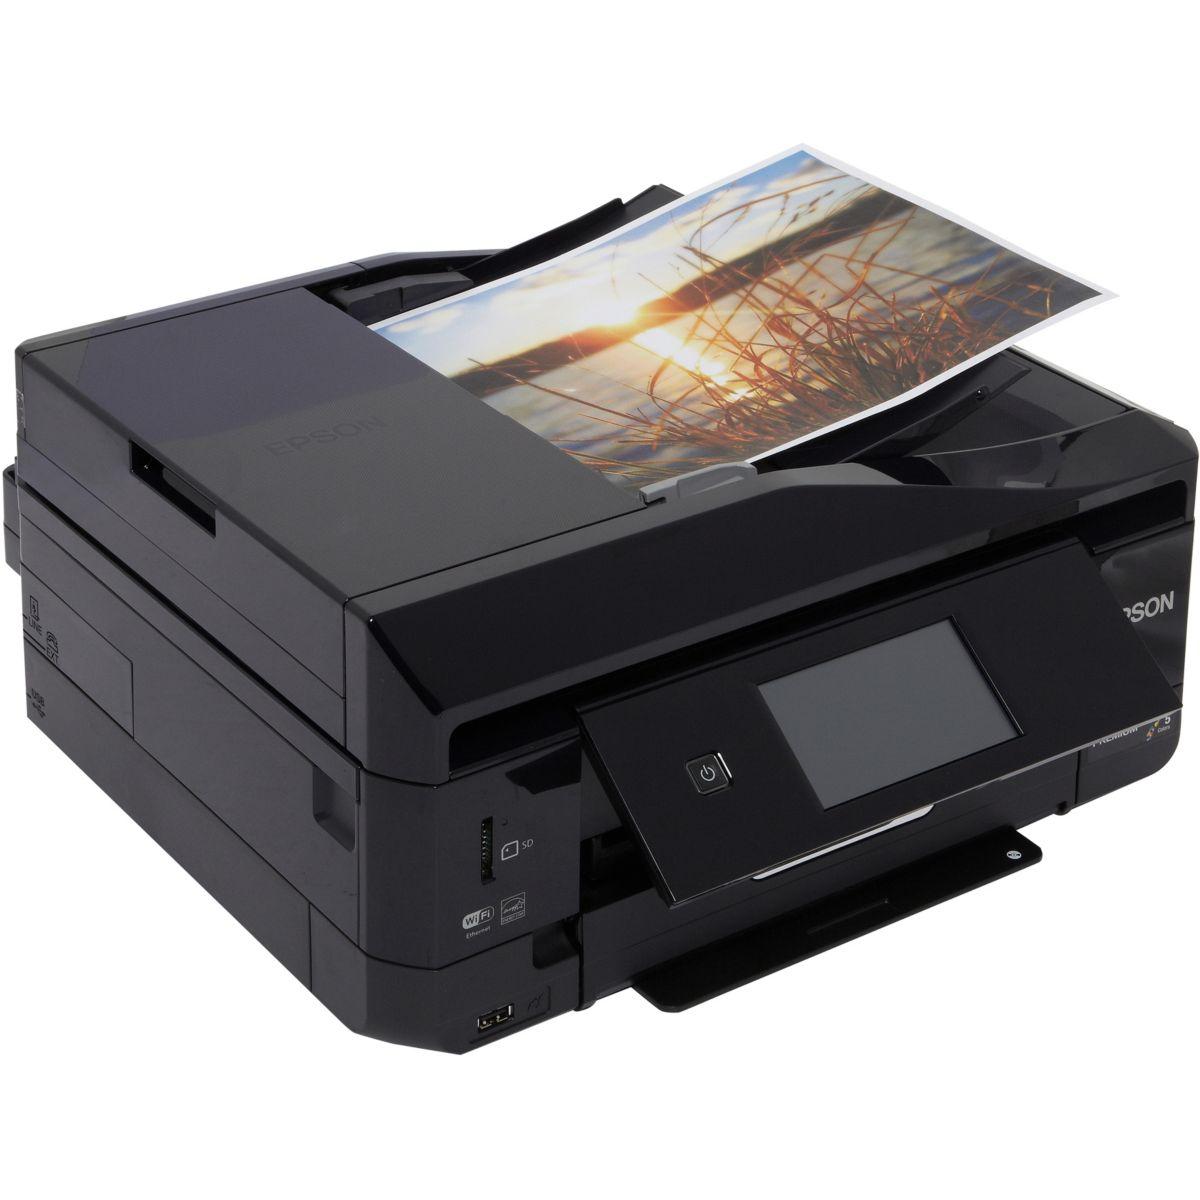 Epson en promos soldes 29 discount total - Imprimante chez darty ...